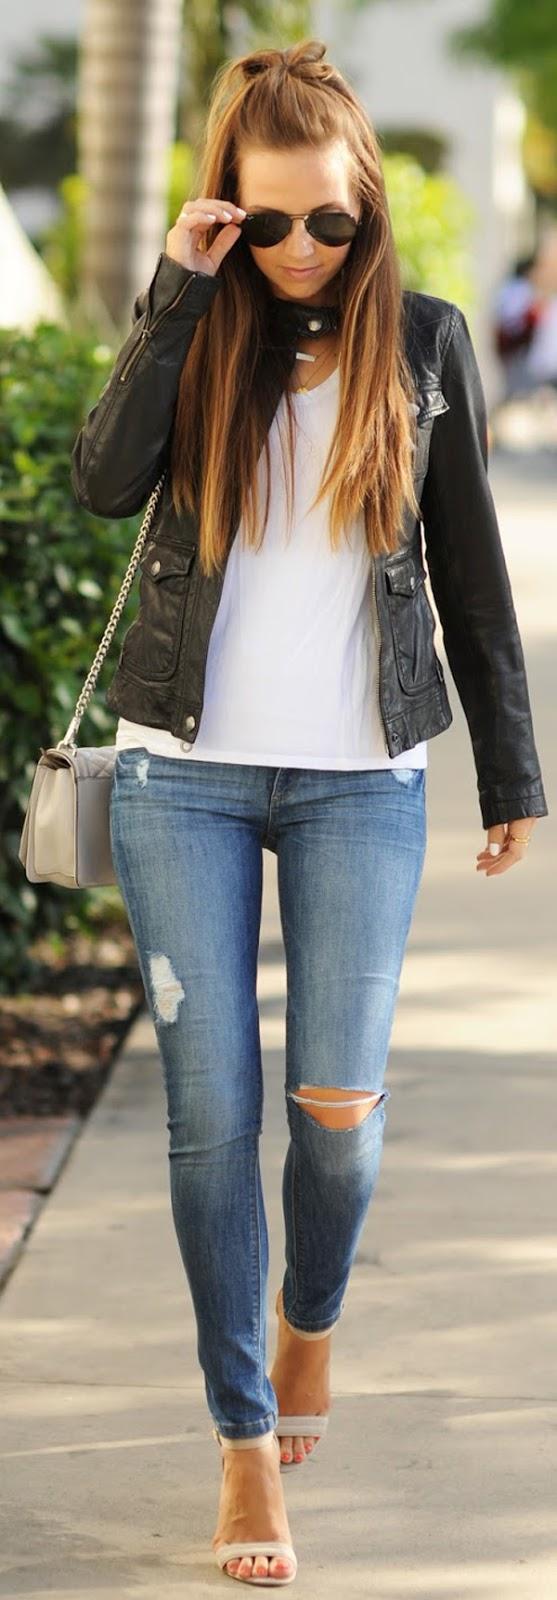 skinny jeans + top